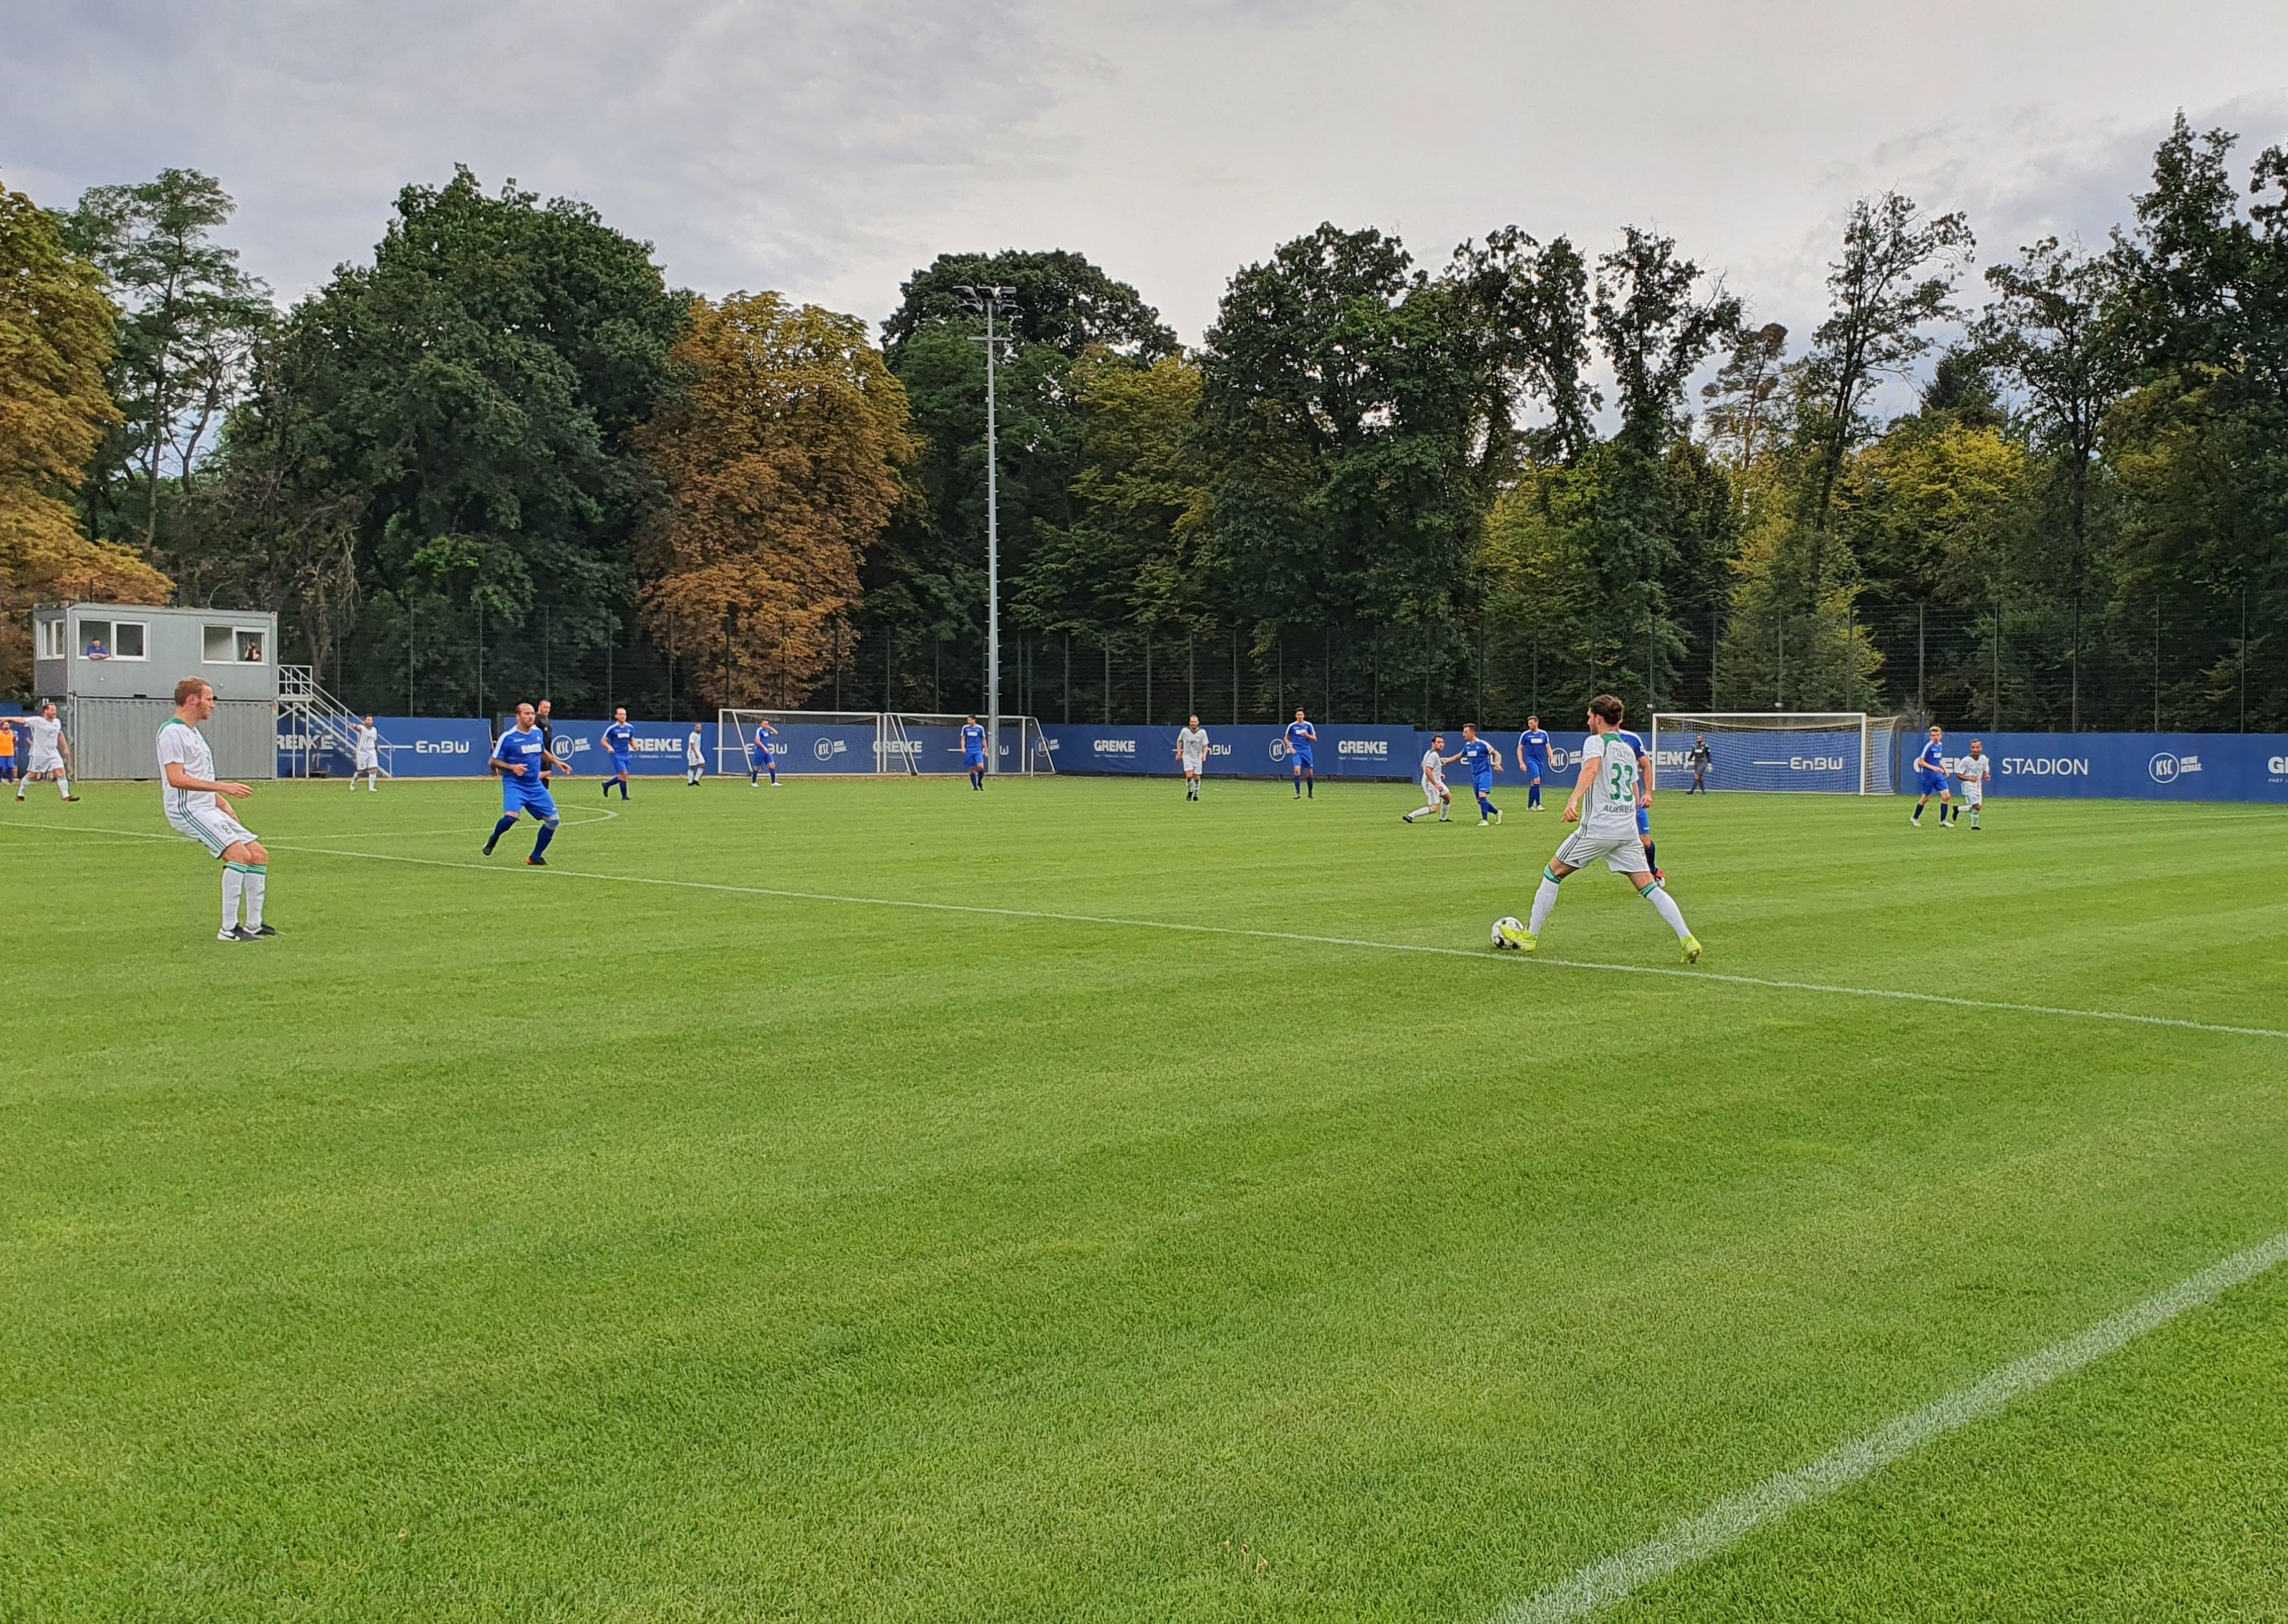 1. Runde bfv-Rothaus-Kreispokal Karlsruhe